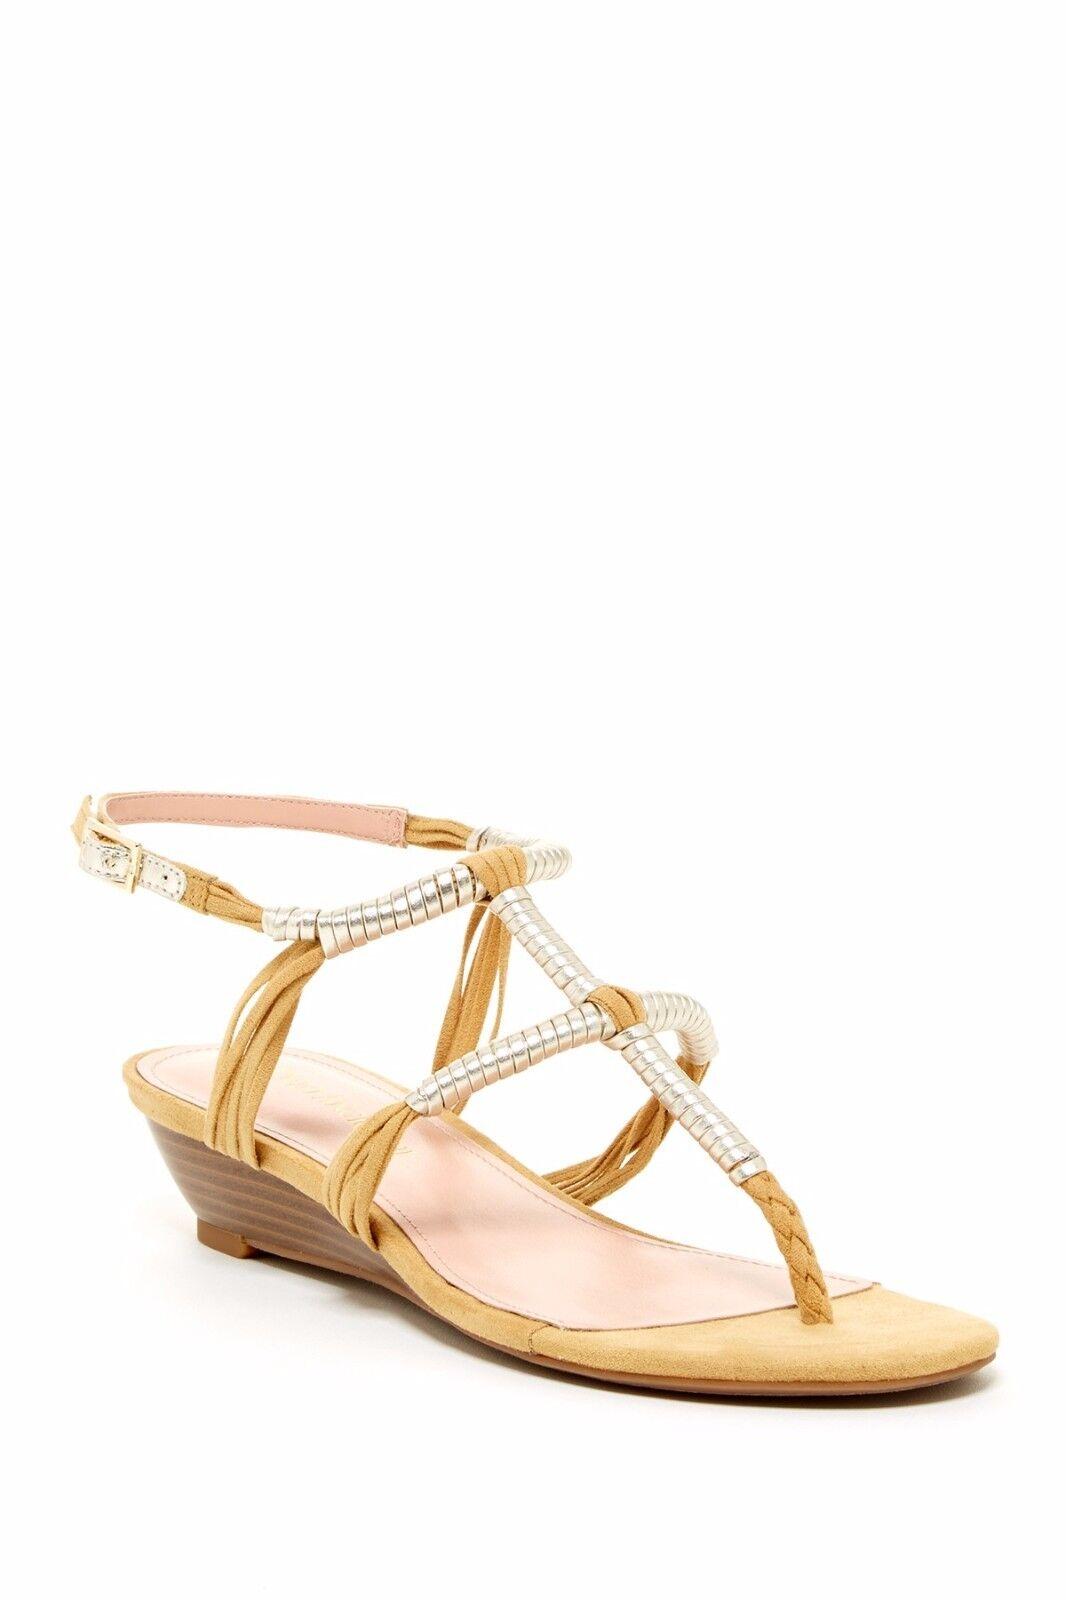 New Enzo Angiolini Khanna Wedge  tan  Sandals  women's sz 8